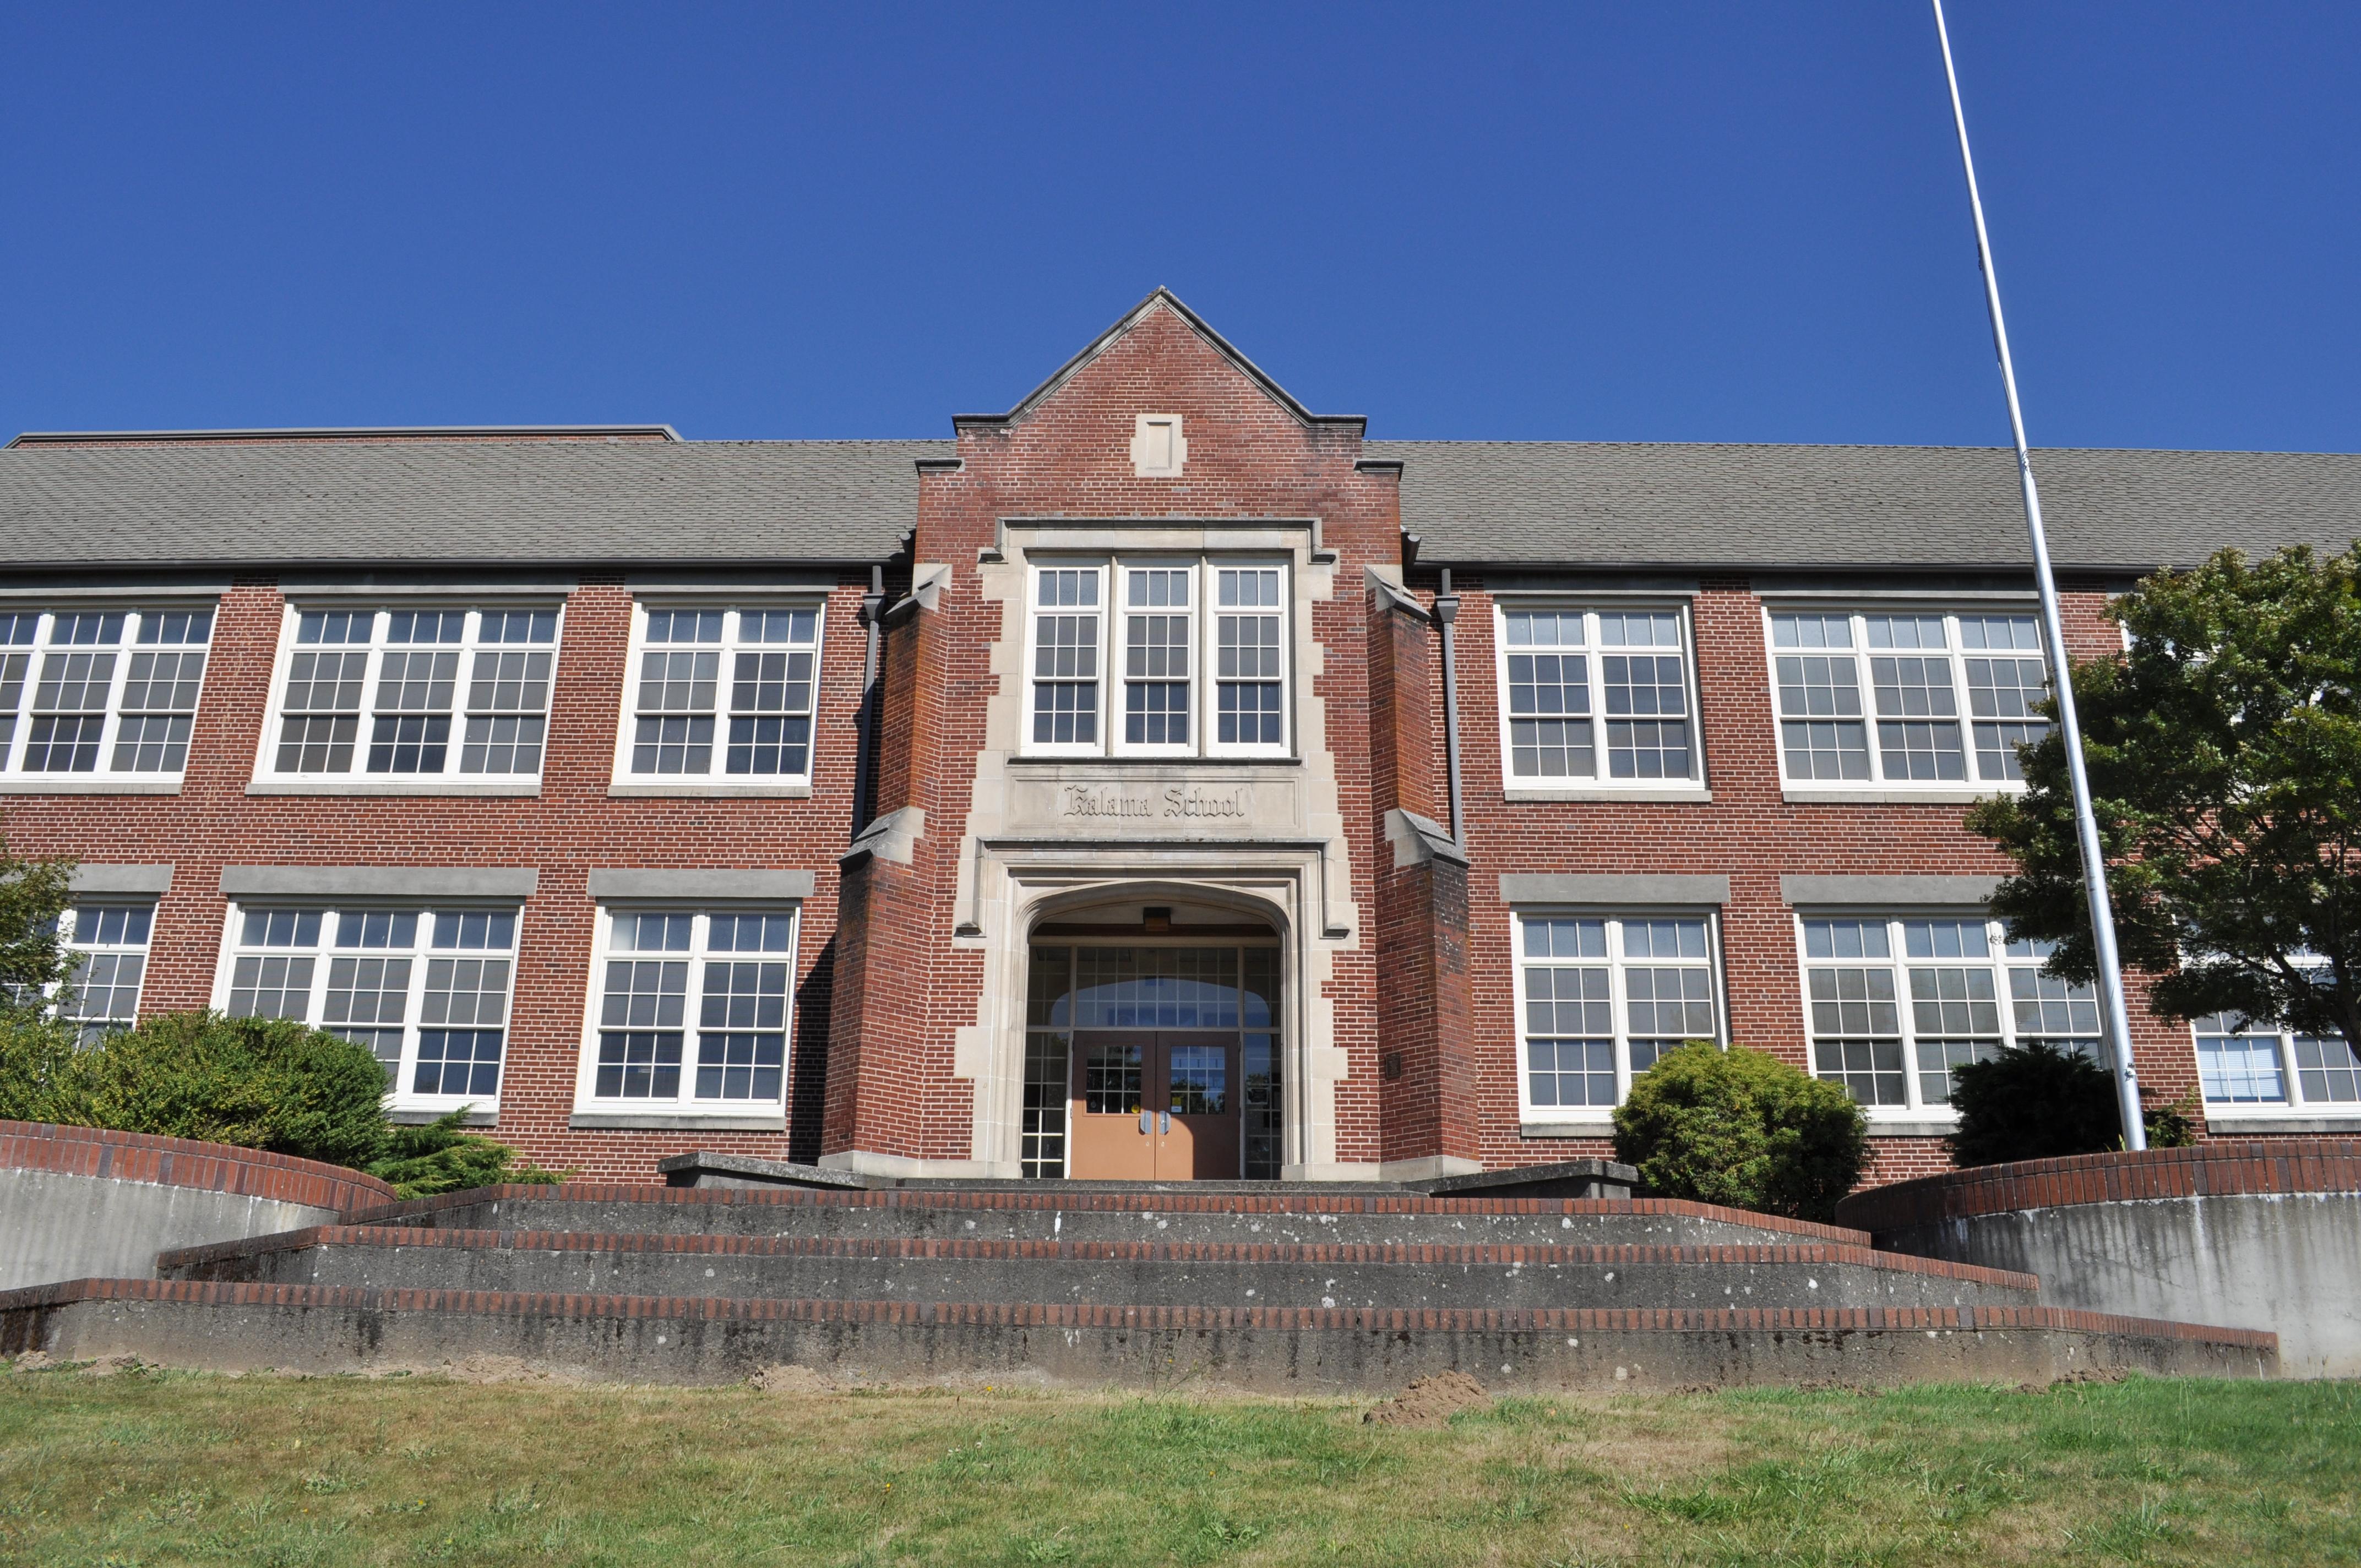 School District For Oak Island Nc